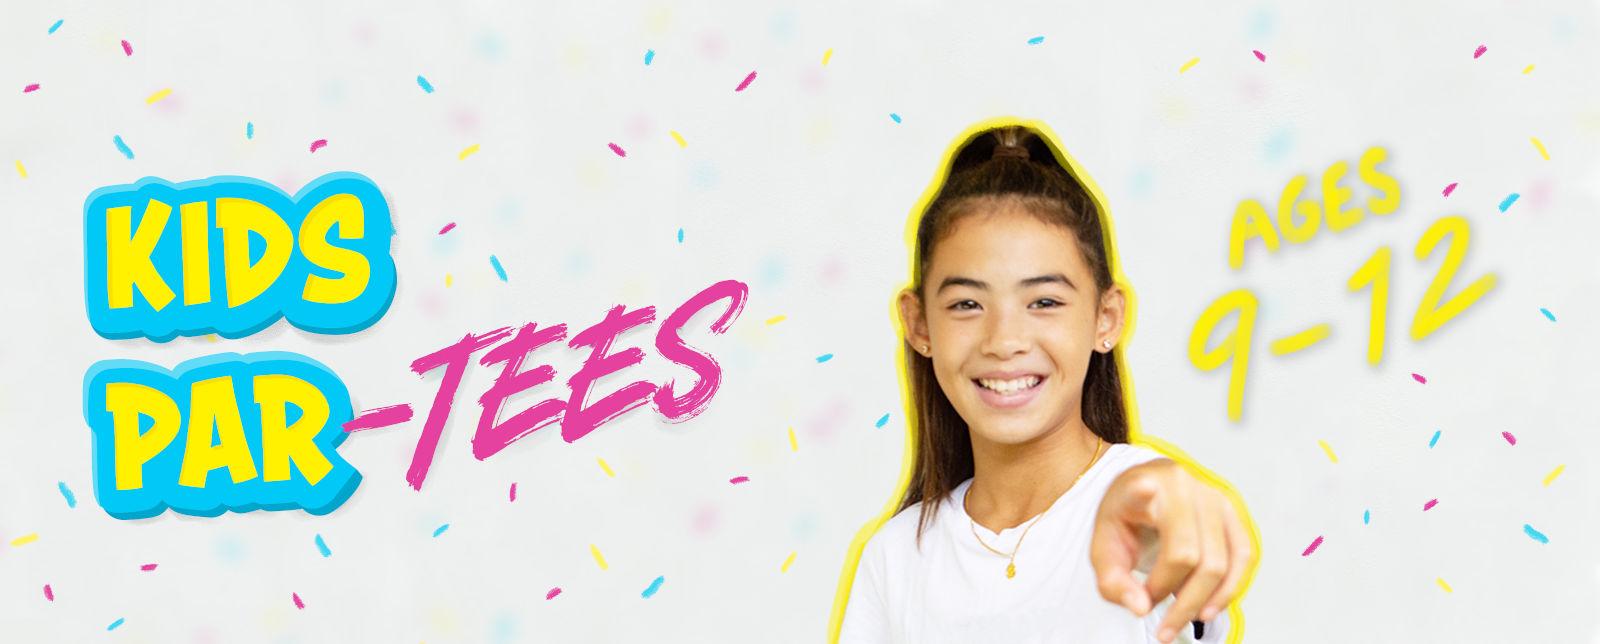 kidspartee-web-banners-kids